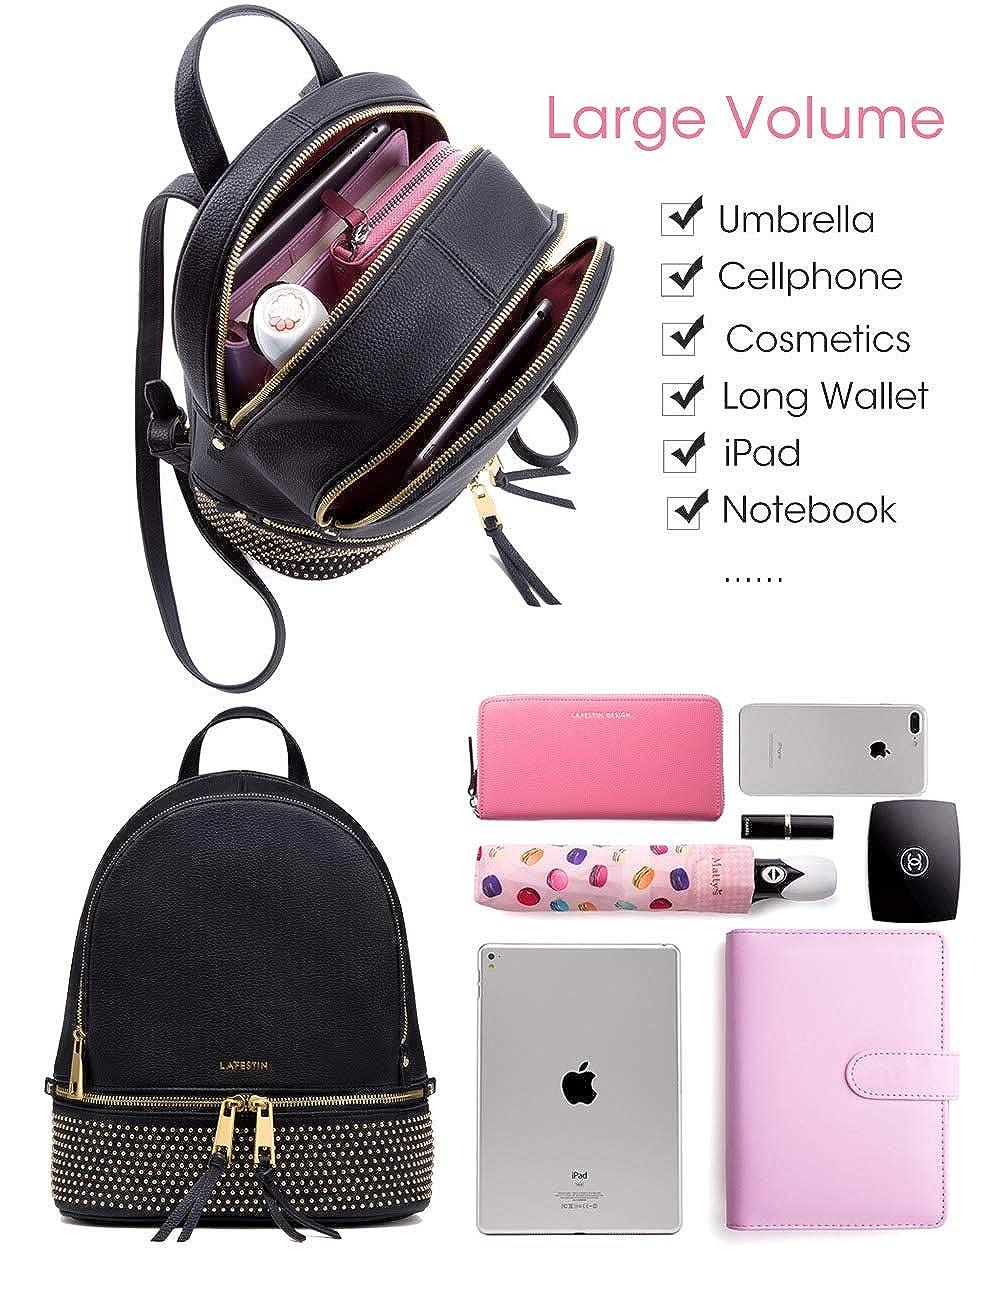 908b57ea14 Amazon.com  LA FESTIN Women s Leather Shoulder Backpacks Stylish Travel  Rucksack Black  Shoes